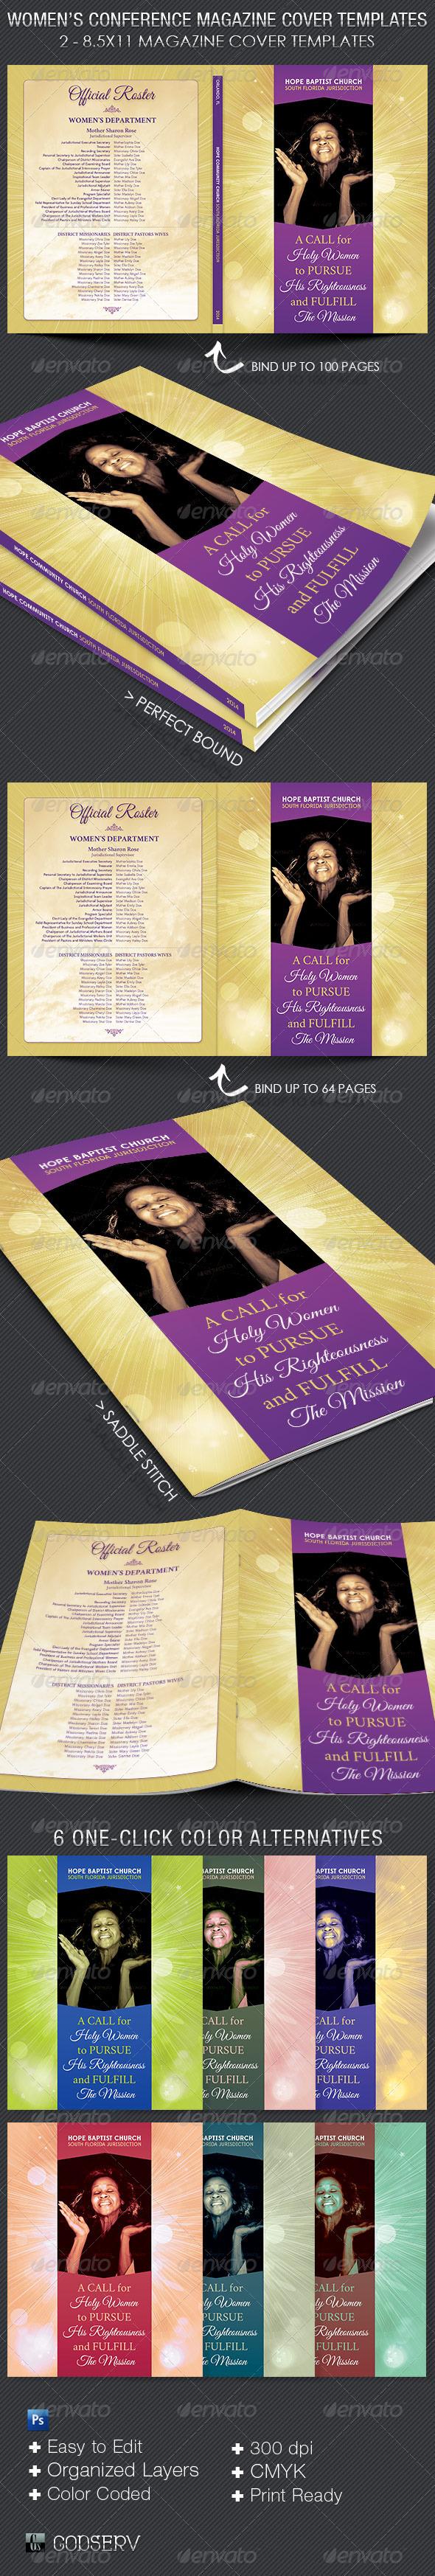 GraphicRiver Women's Convention Magazine Cover Template 5608280